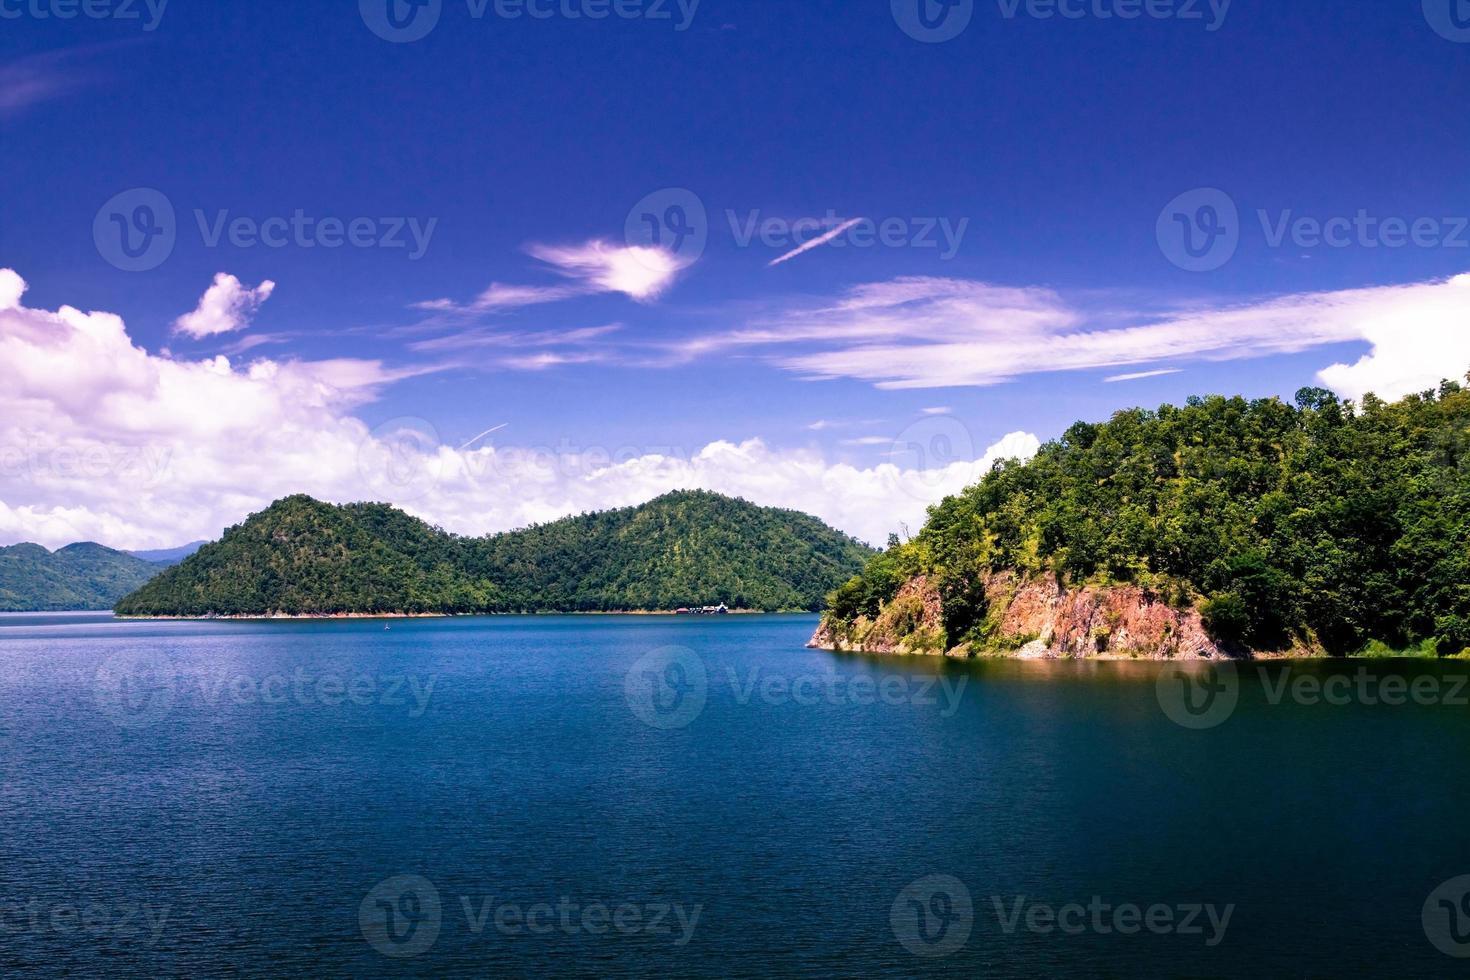 vatten i dammen med blå himmel foto